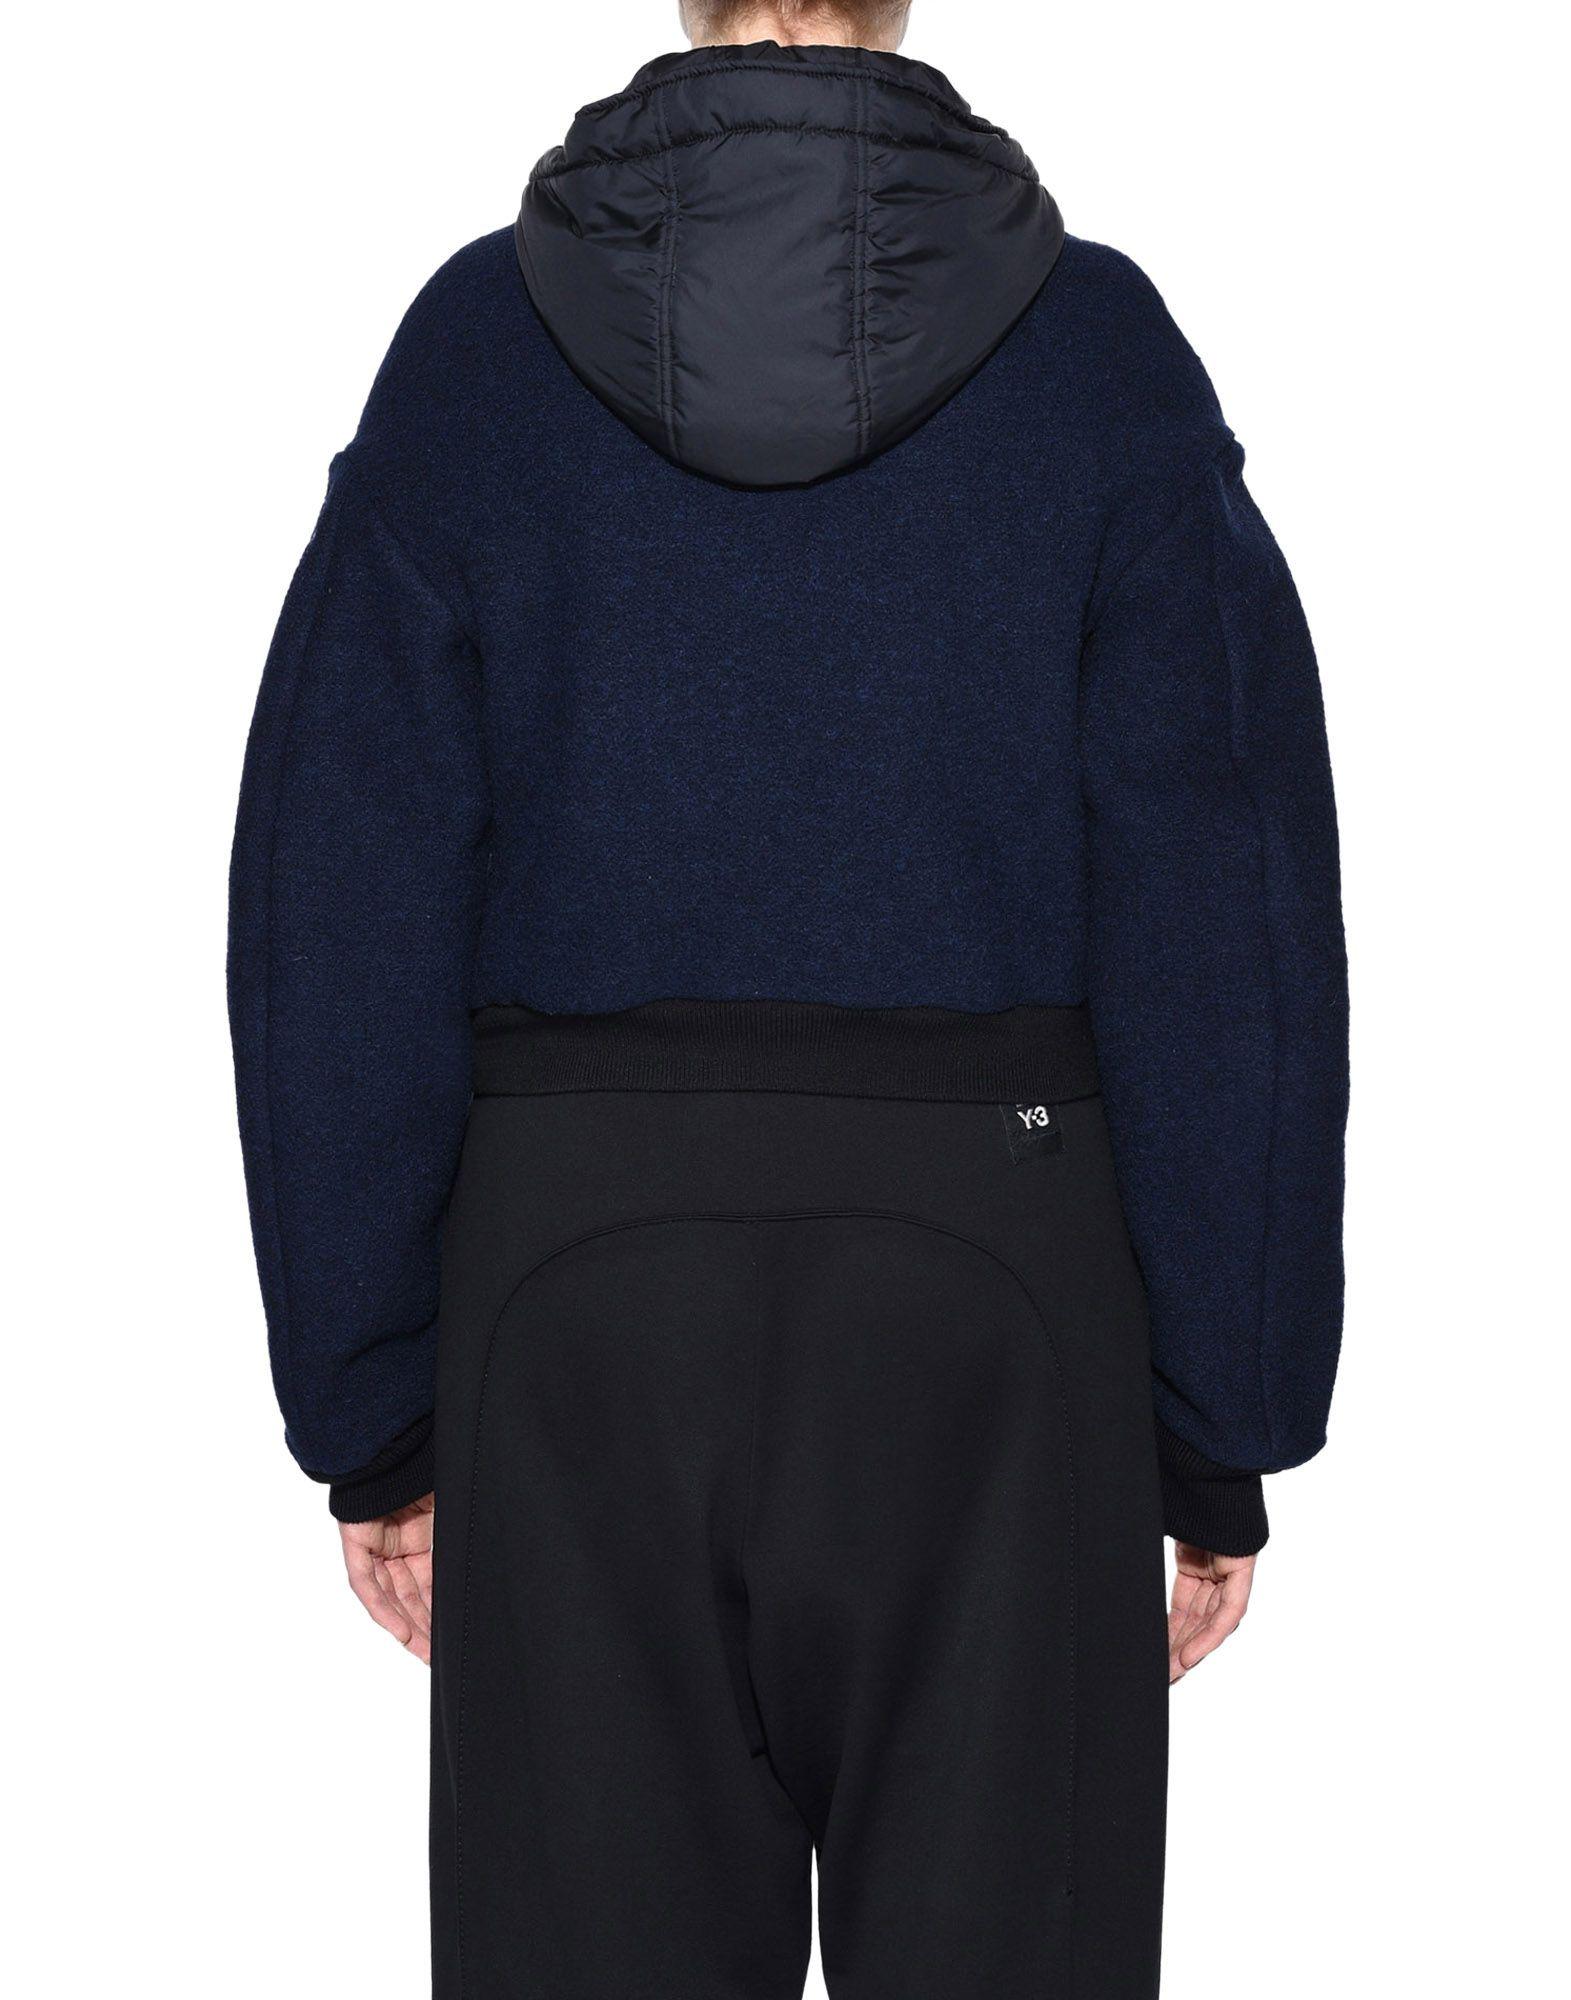 Y-3 Y-3 Wool Hoodie Jacket ブルゾン レディース d